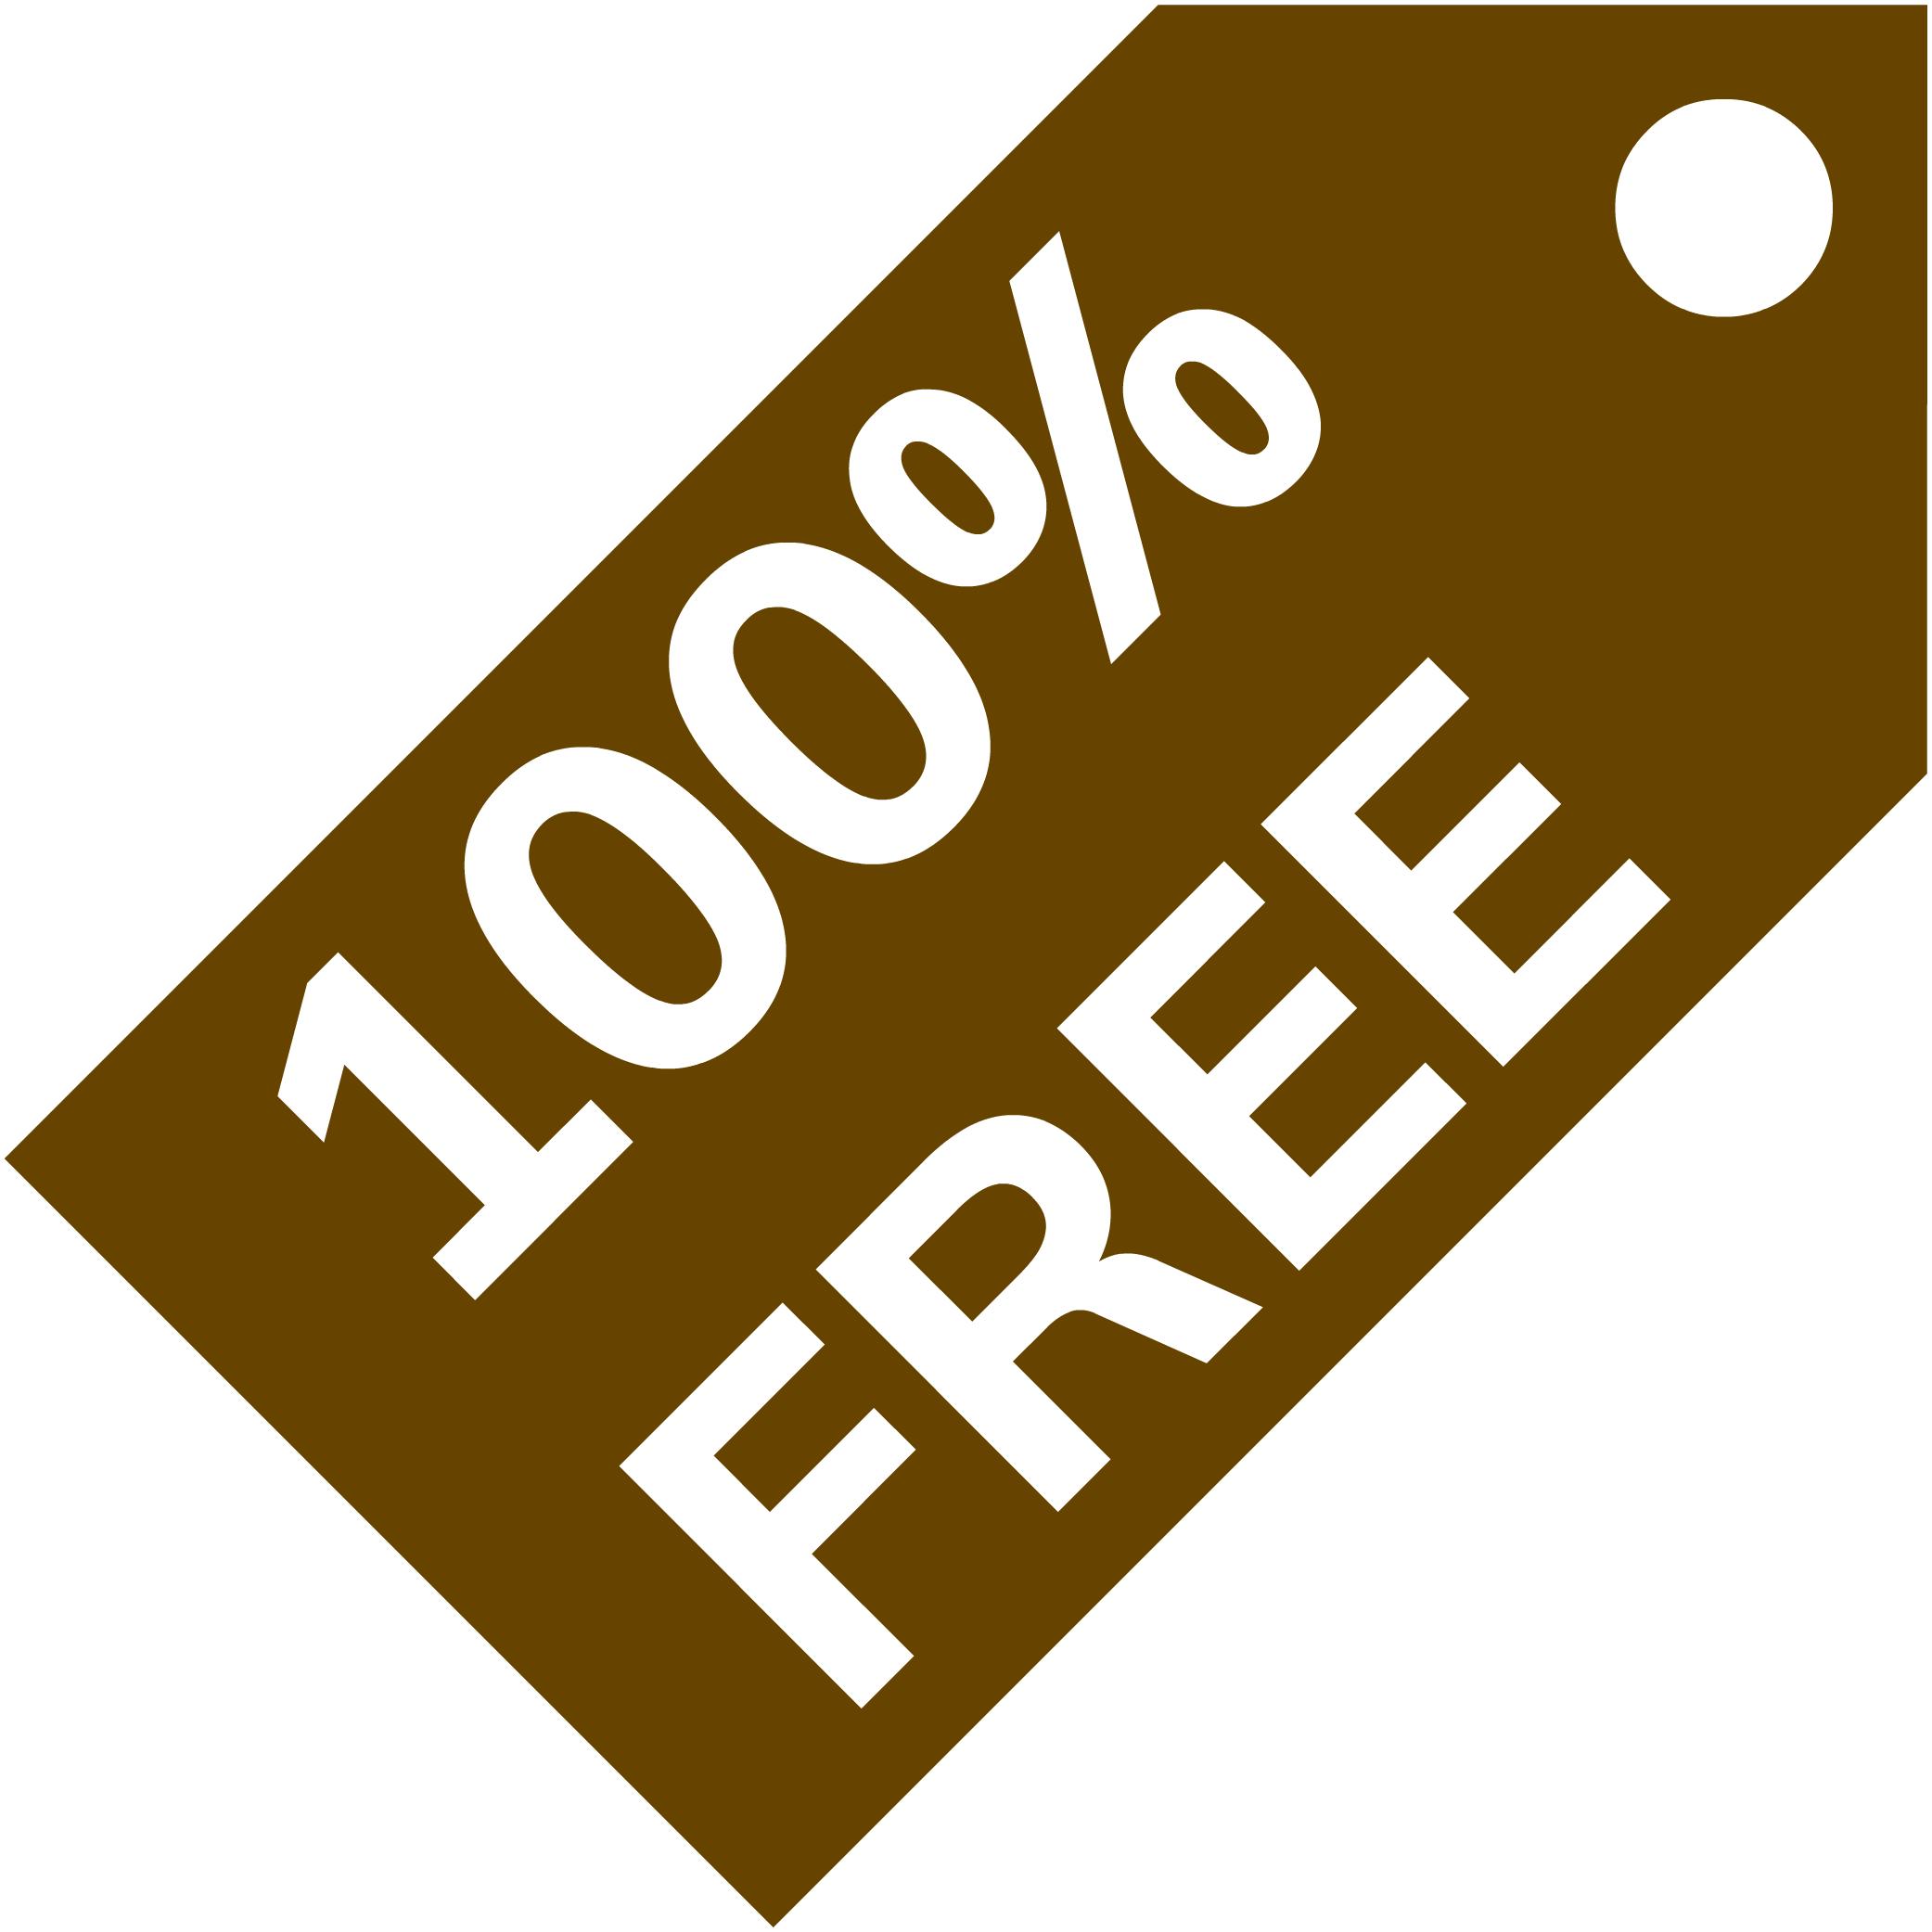 Free resources icon